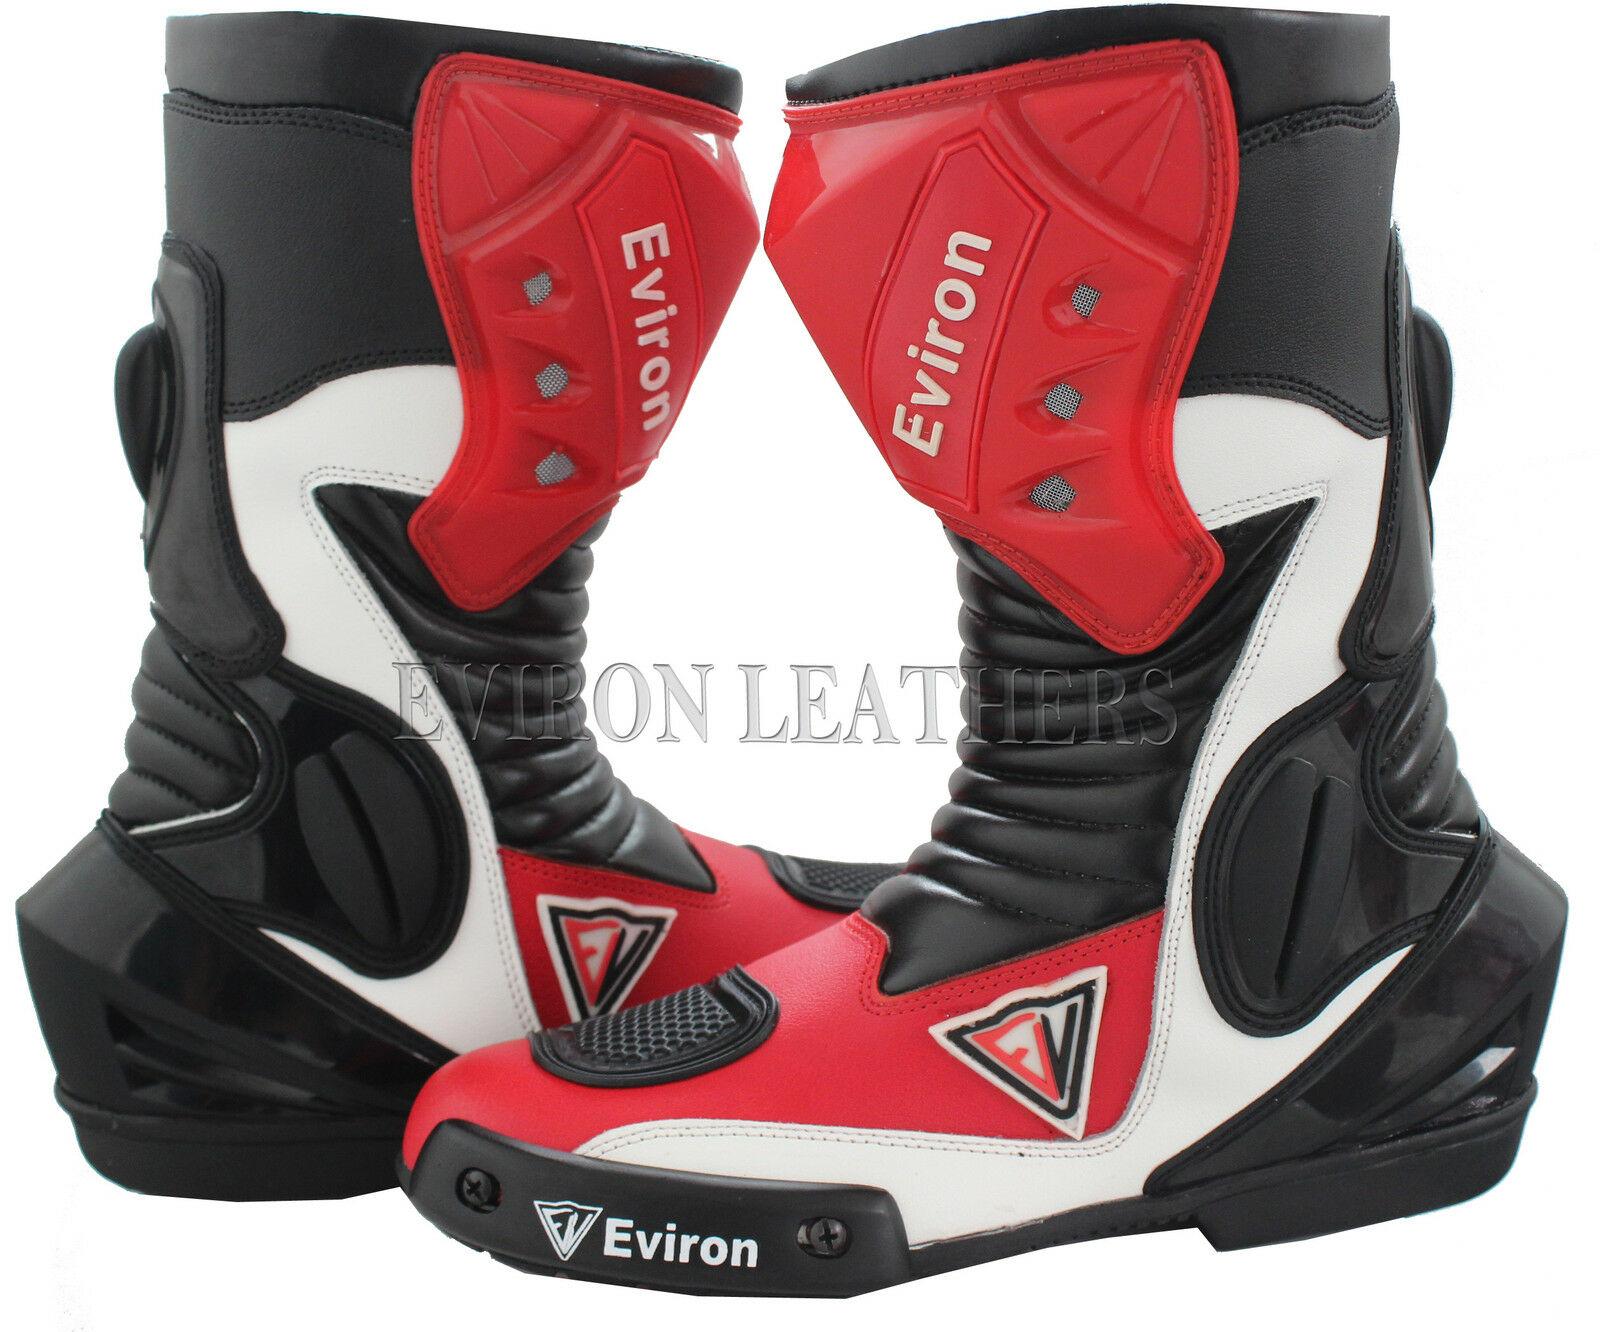 50% off Ducati Boots